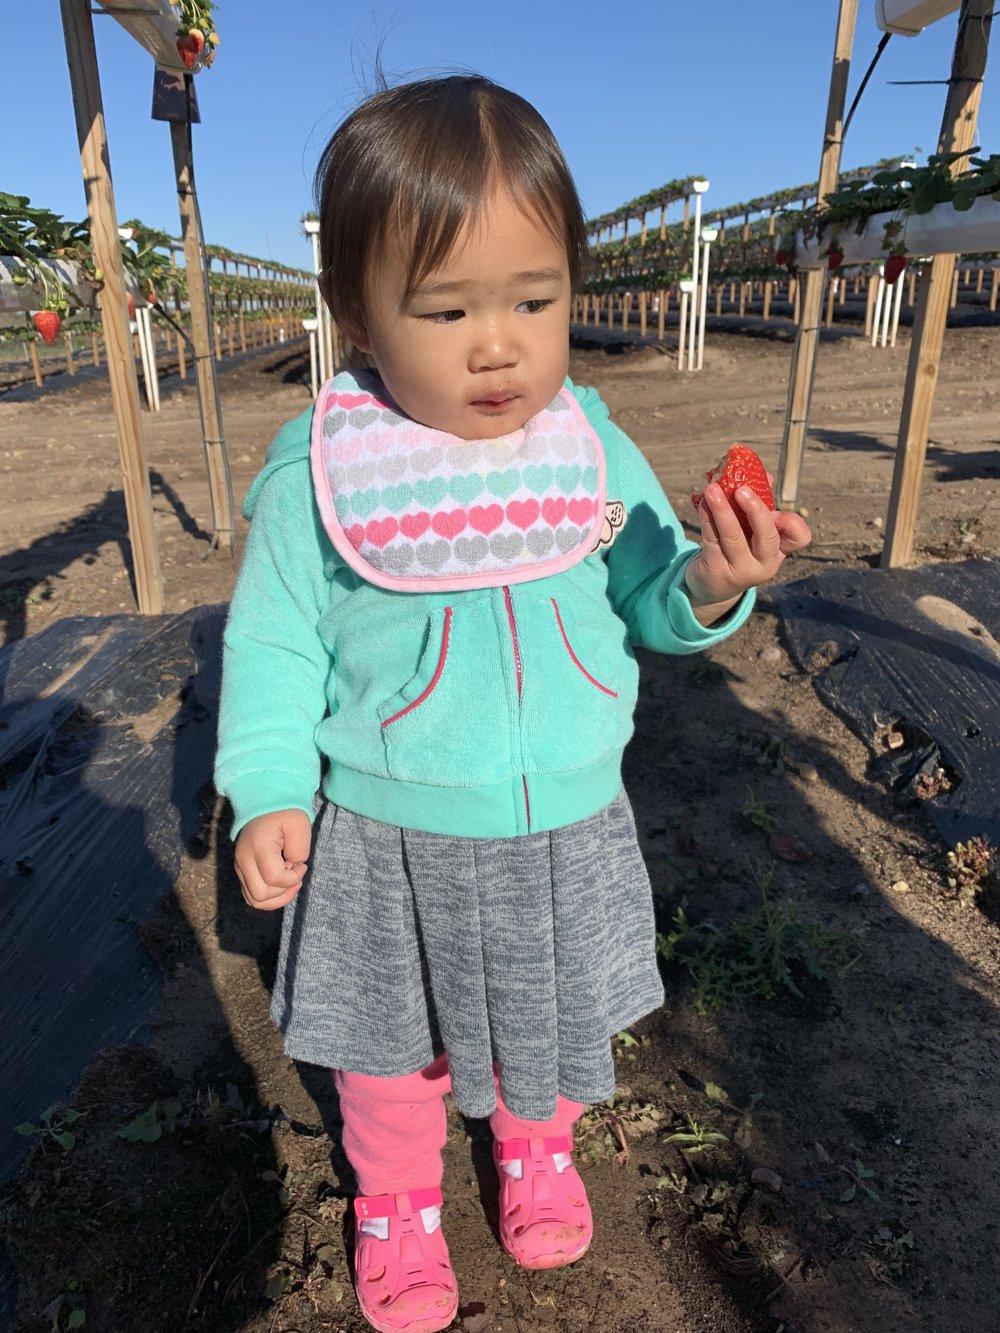 Kaylee eating Strawberry